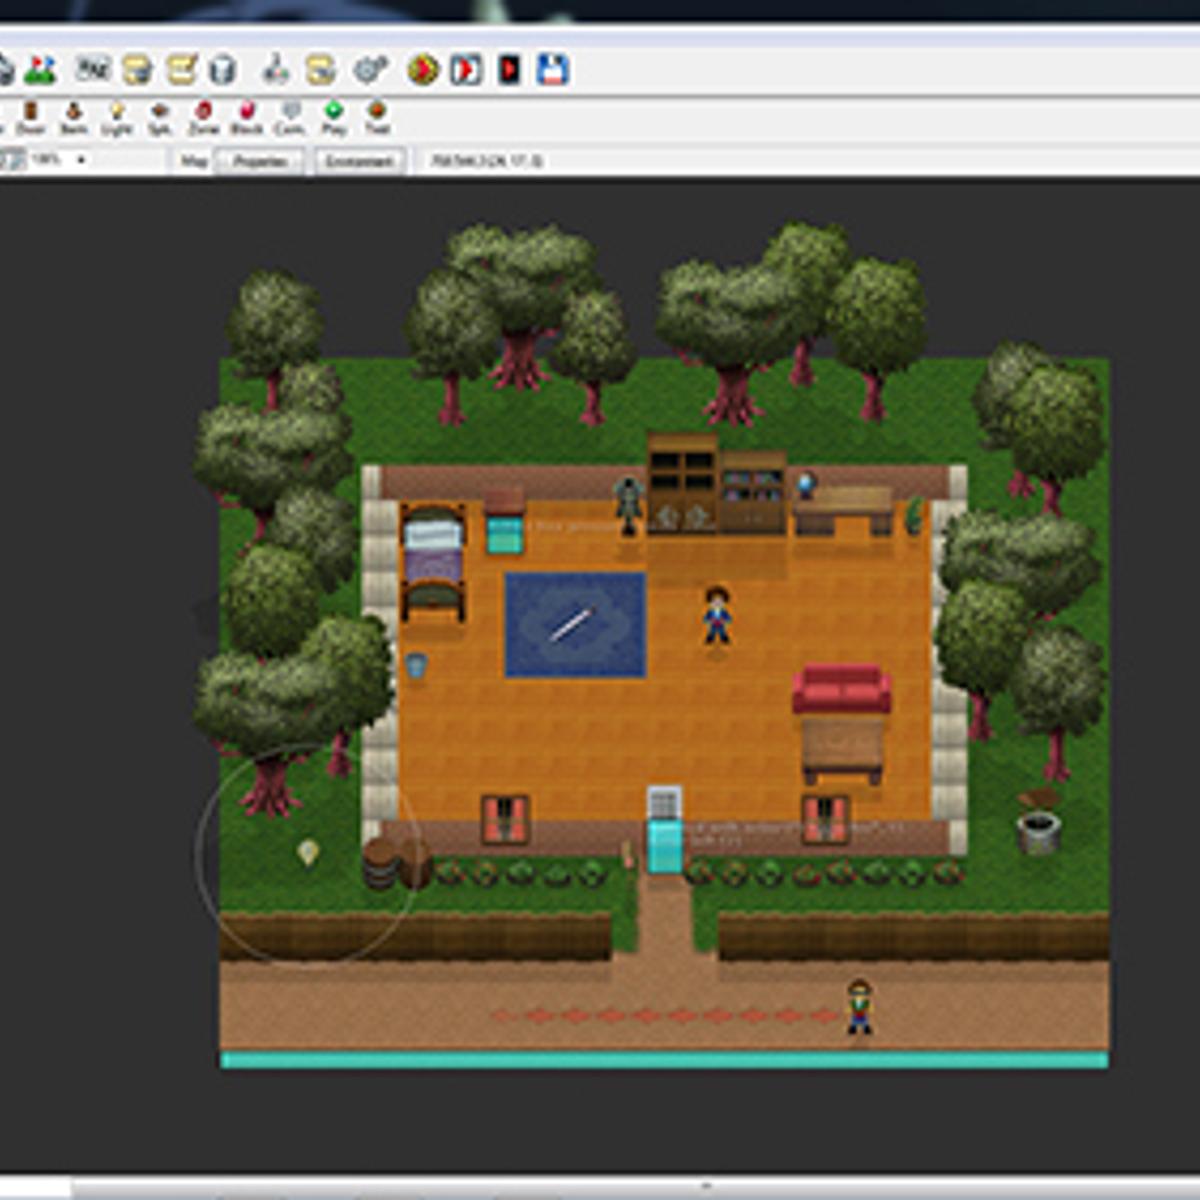 001 Game Creator Alternatives and Similar Games